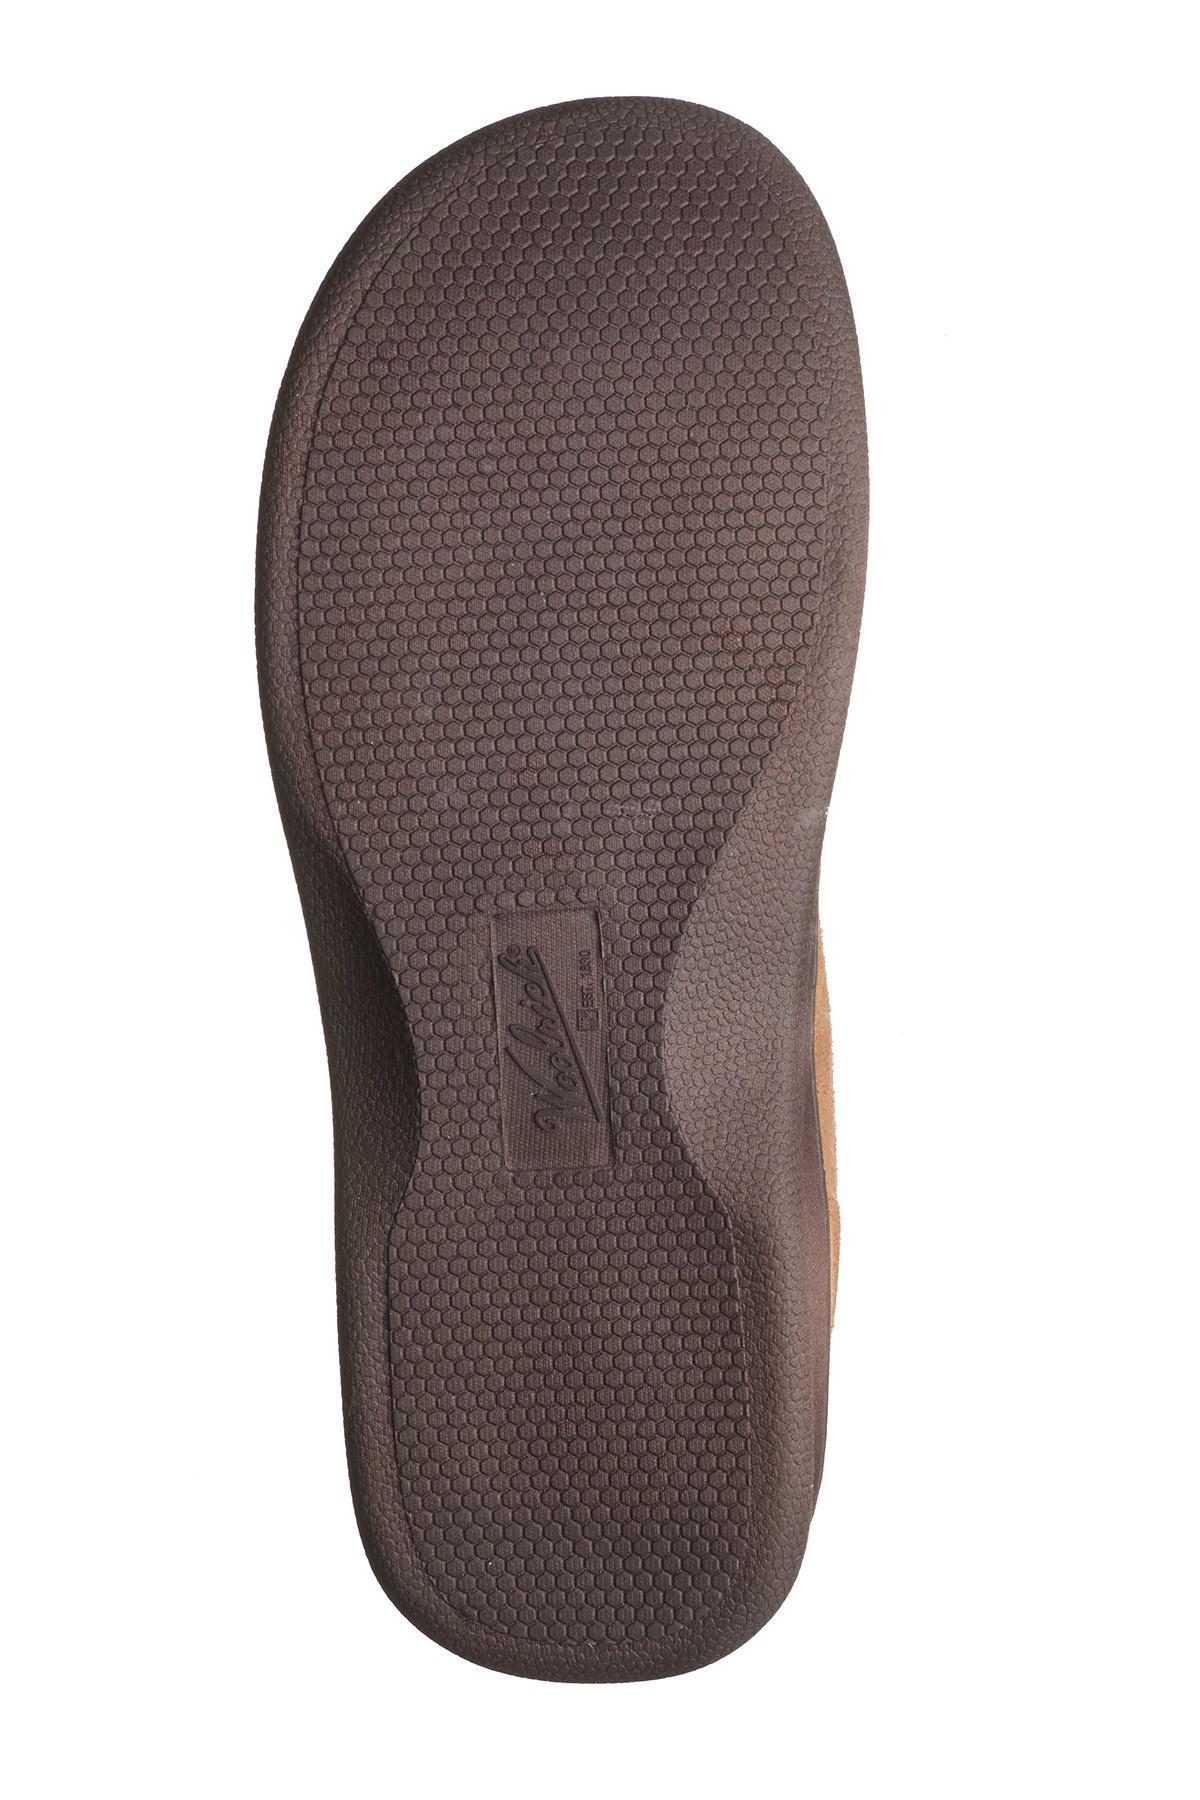 4b8617d33ef3 Woolrich - Brown Buck Run Faux Shearling Trim   Lined Slipper for Men -  Lyst. View fullscreen